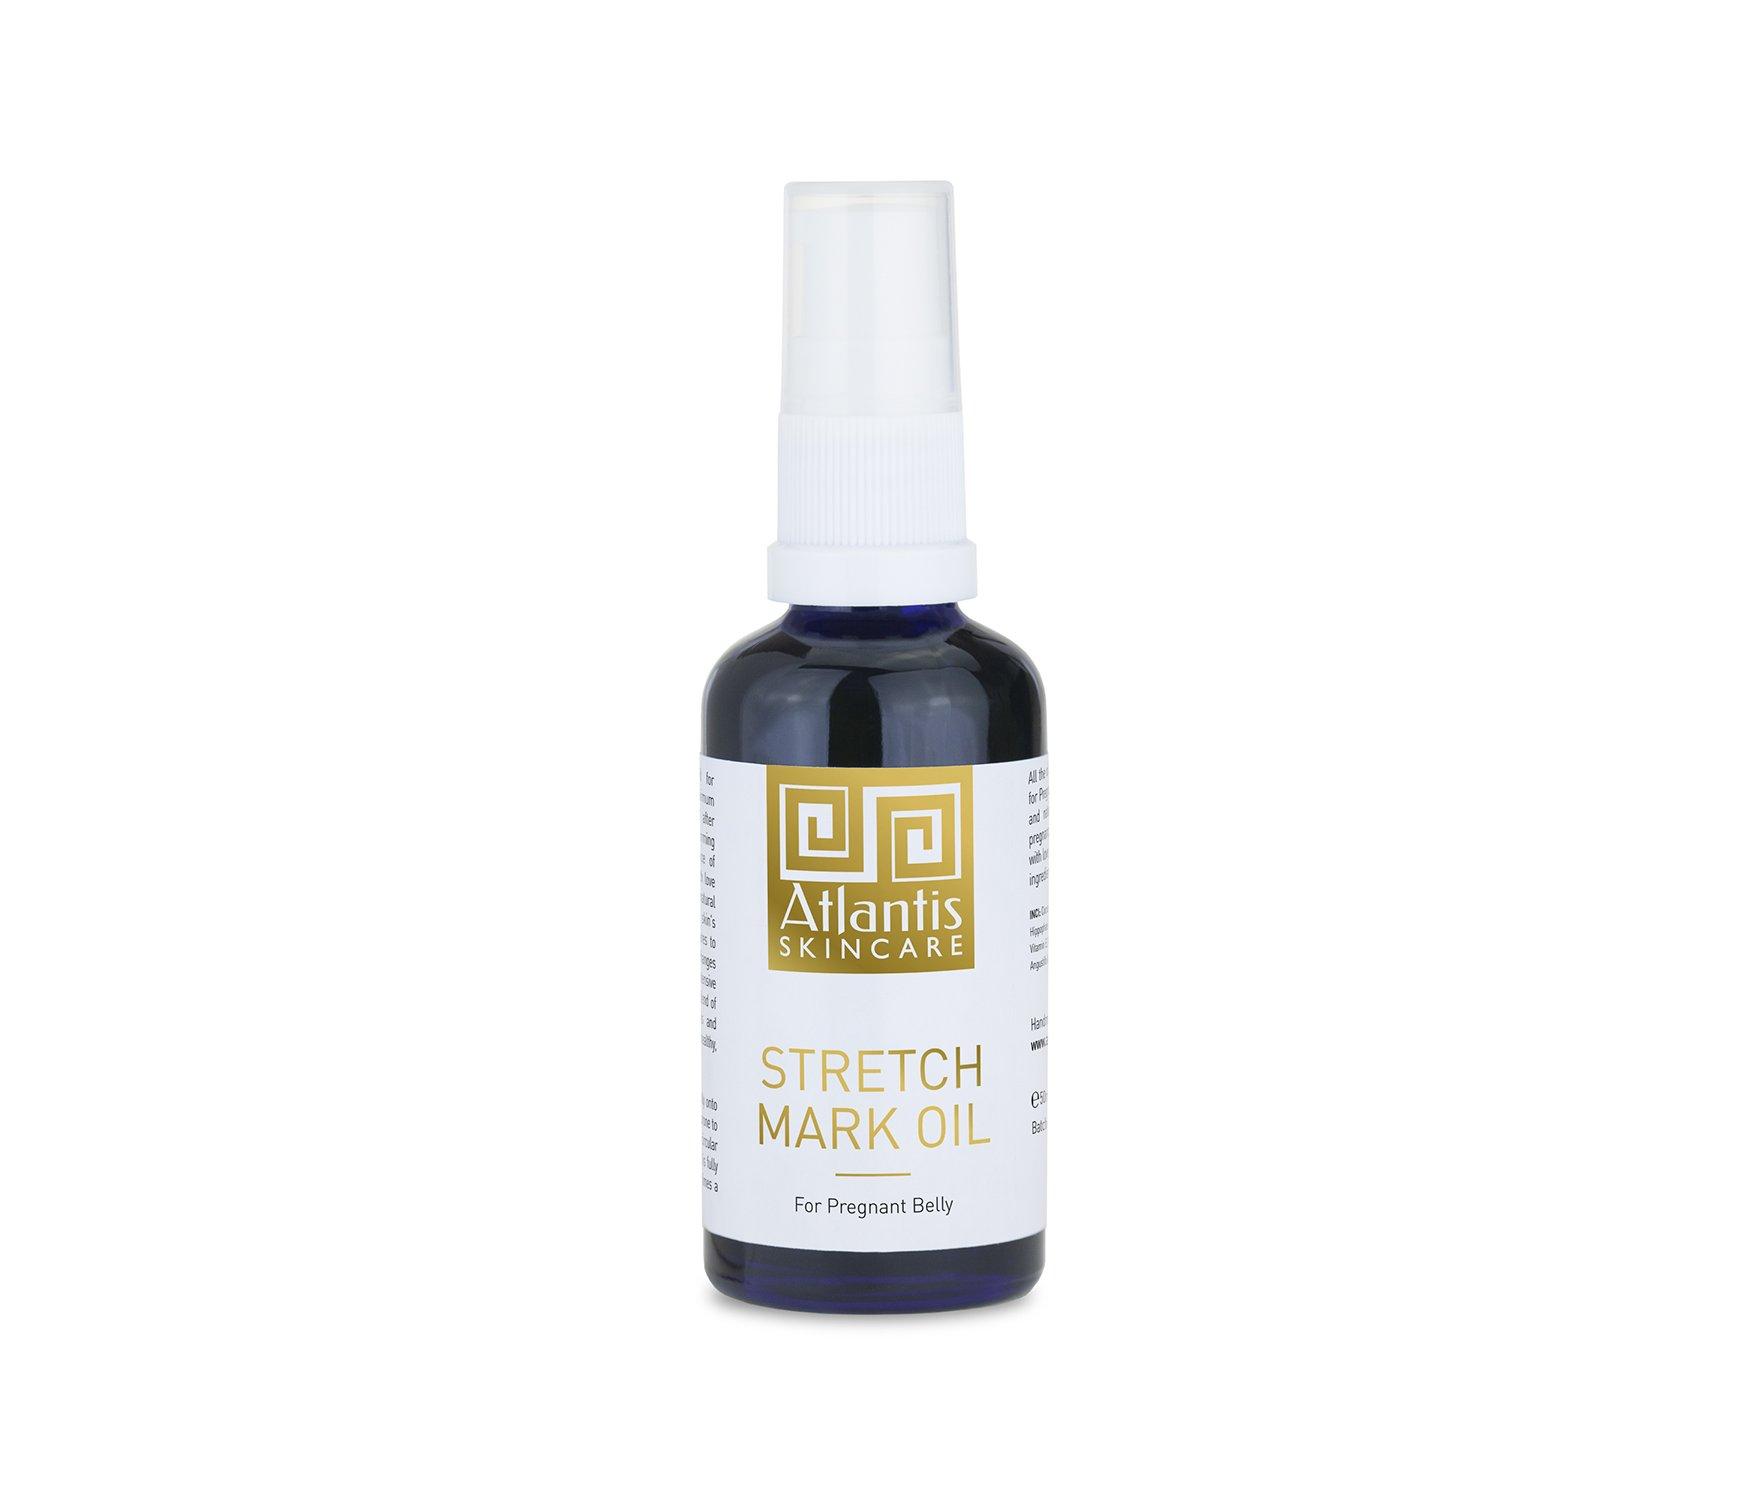 Atlantis Skincare Stretch Mark Oil for Pregnant Belly 50ml/1.76oz